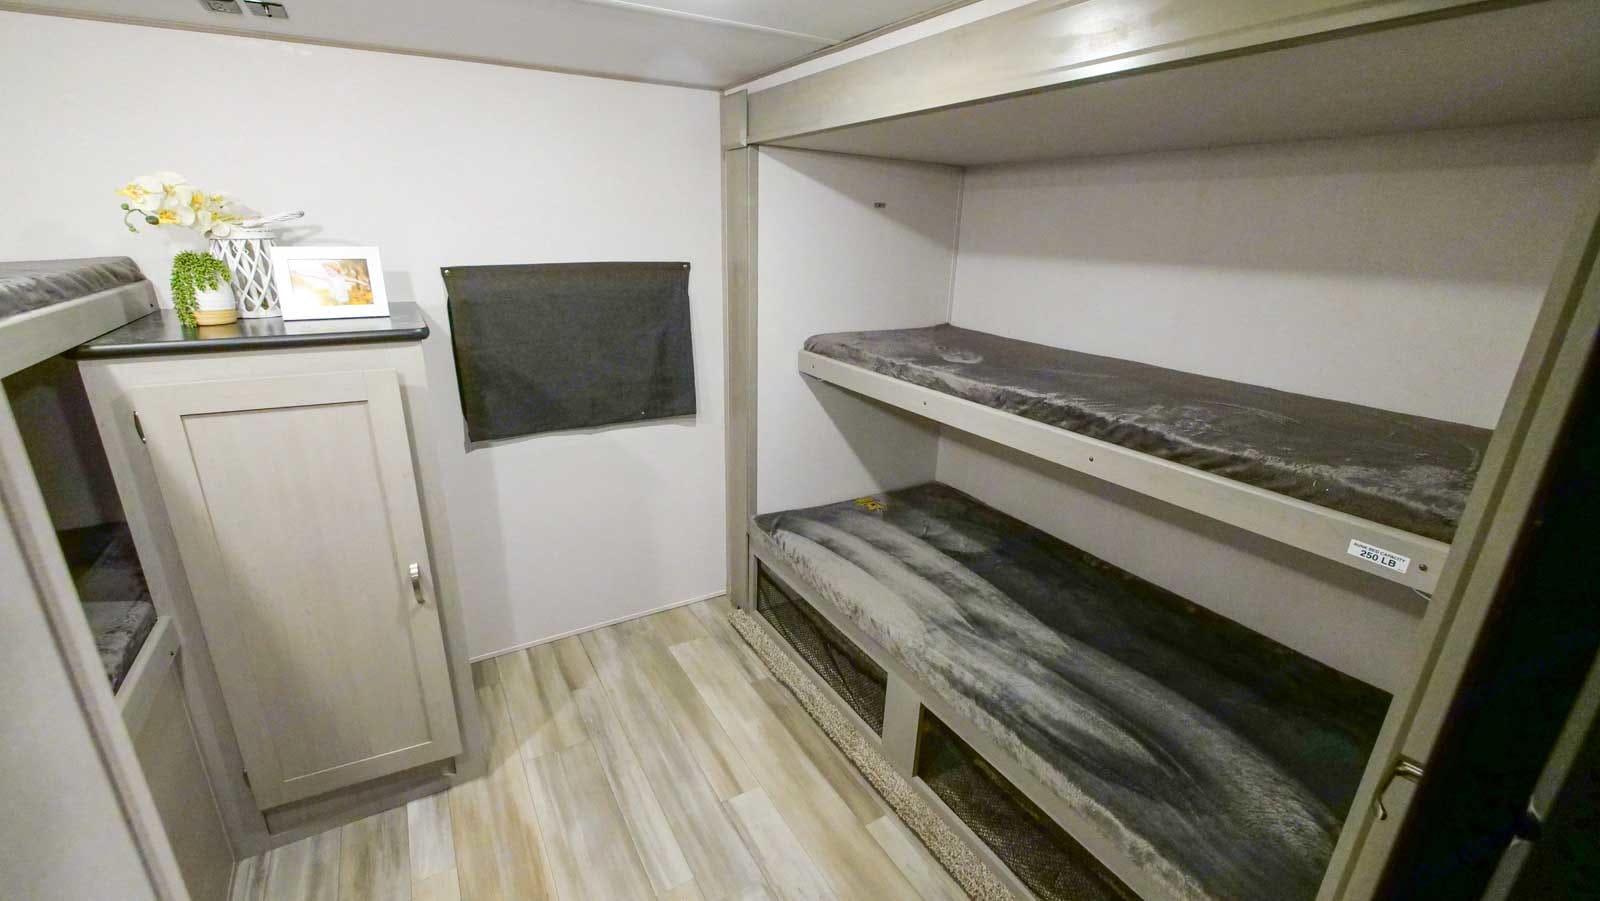 Quad bunk room - beds 3 & 4. Prime Time Tracer 2021